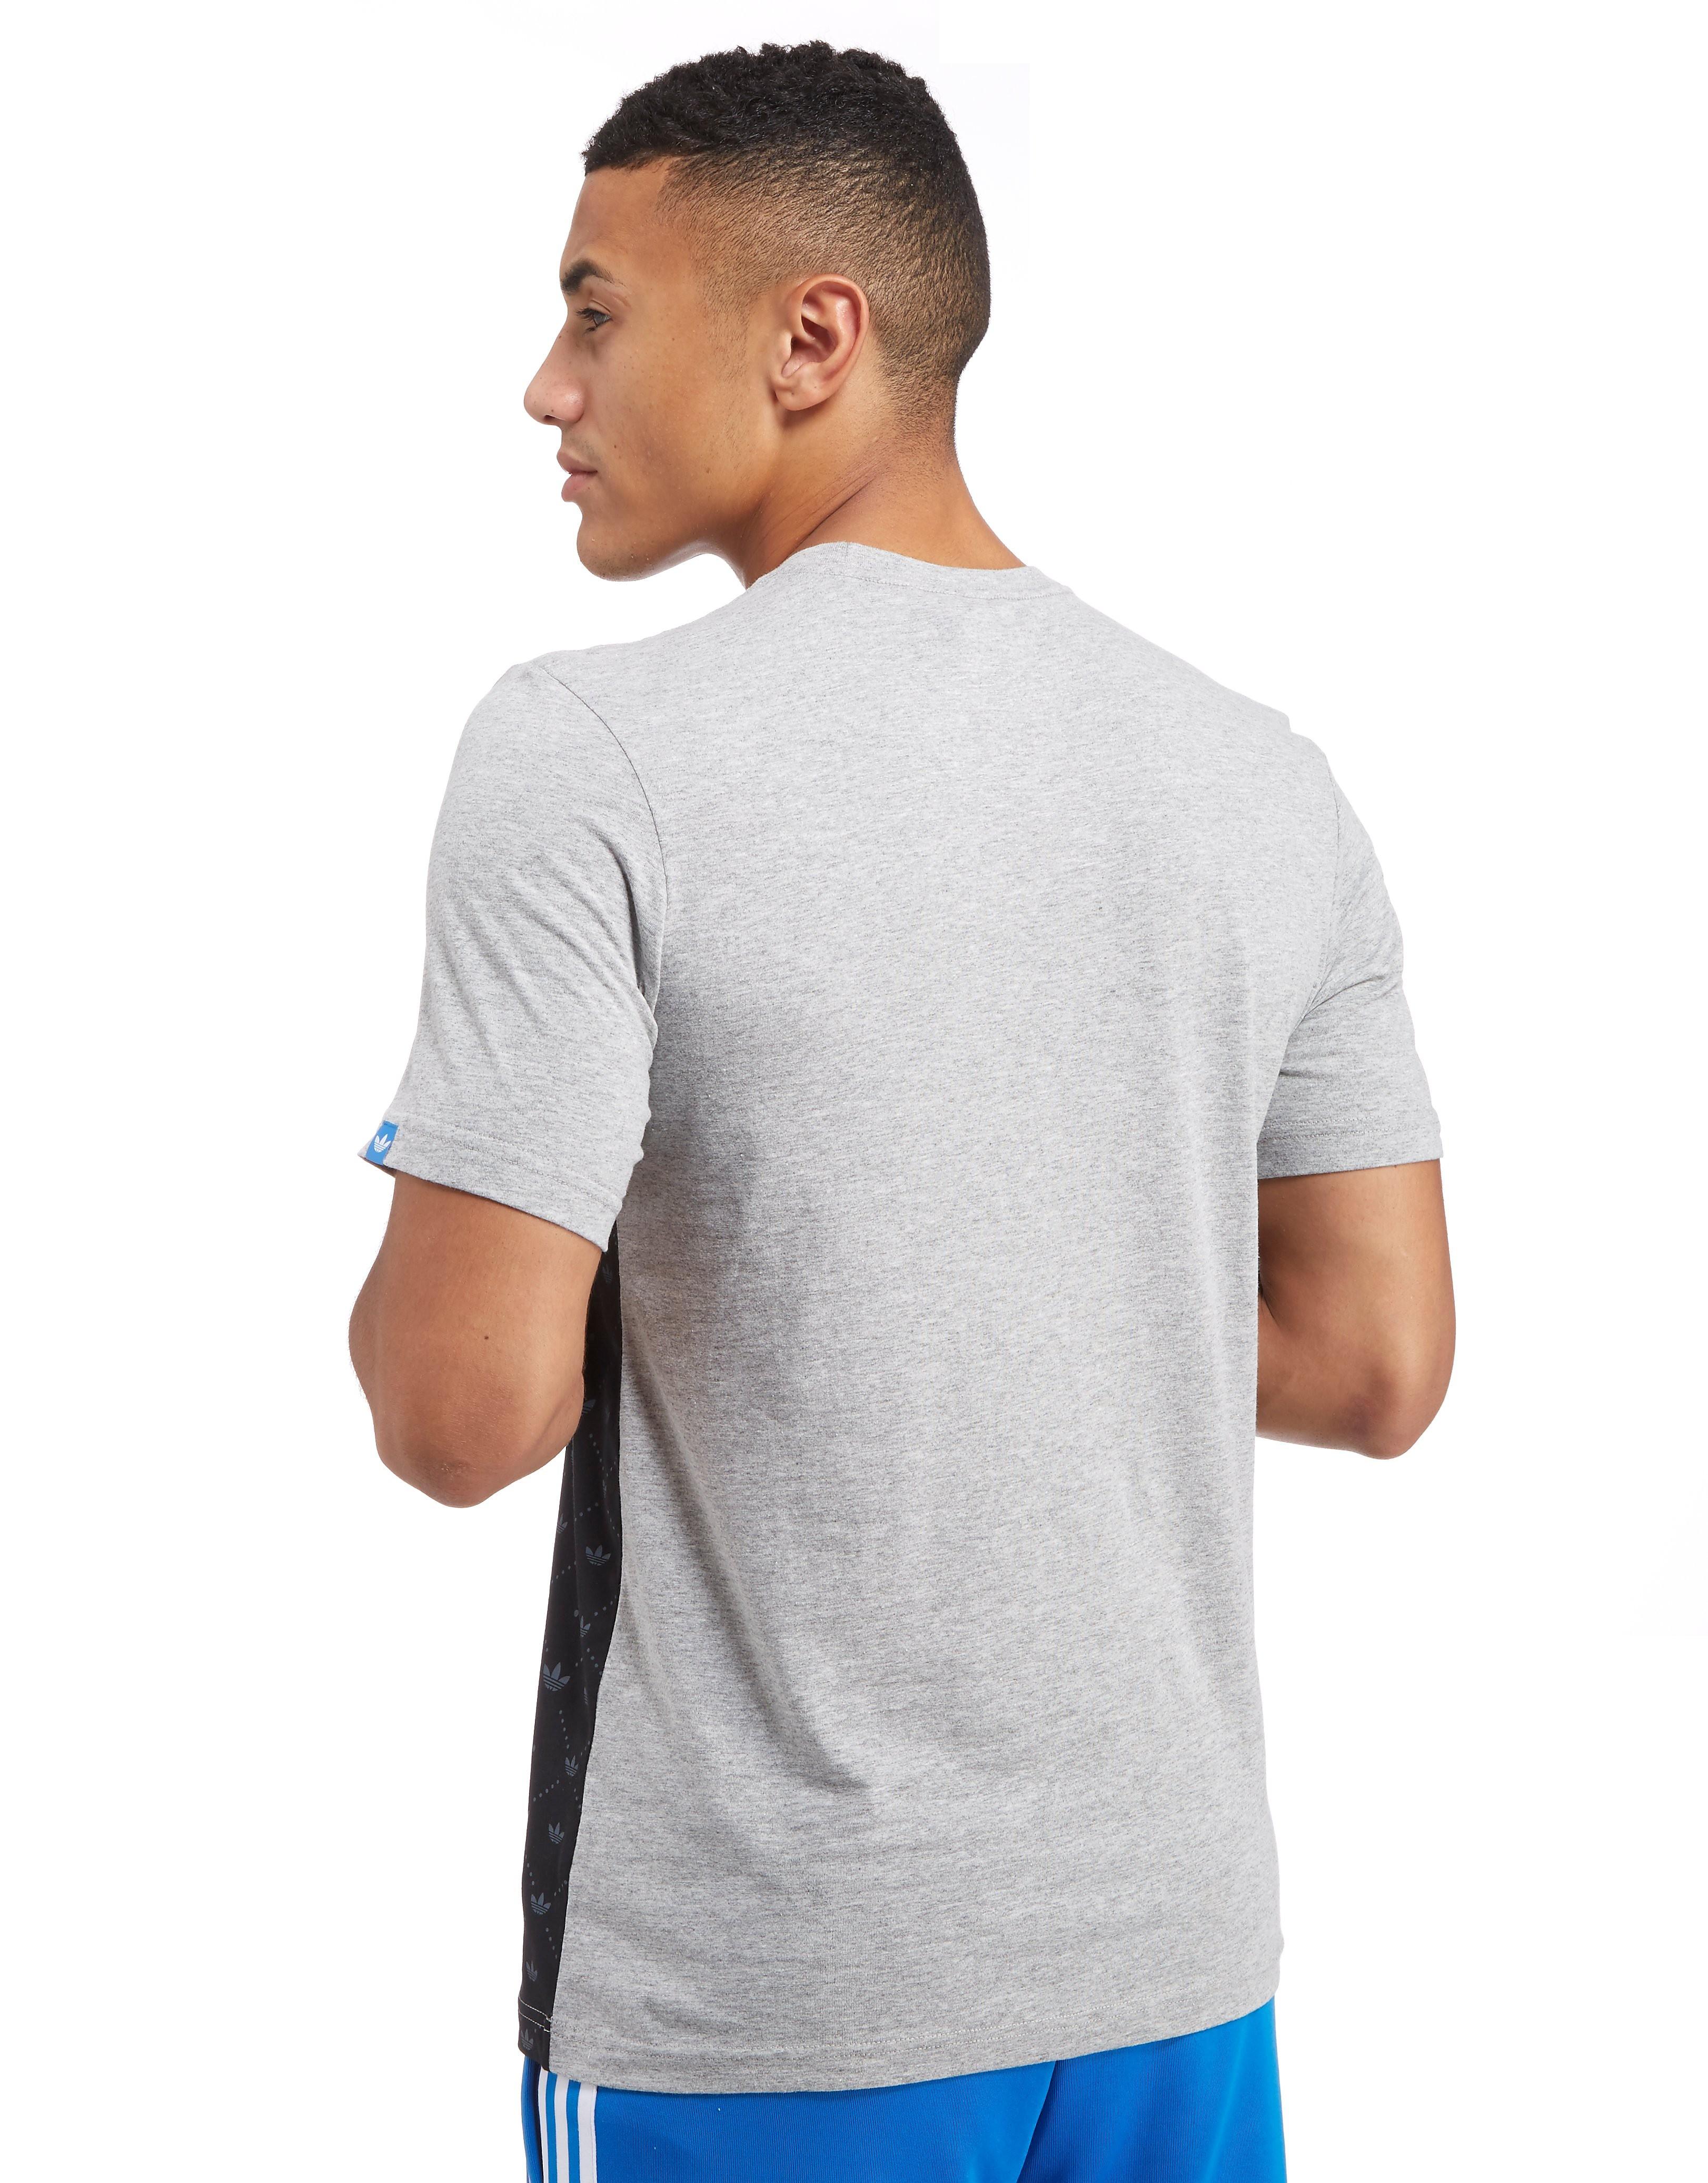 adidas Originals Trefoil Panel Repeat T-Shirt